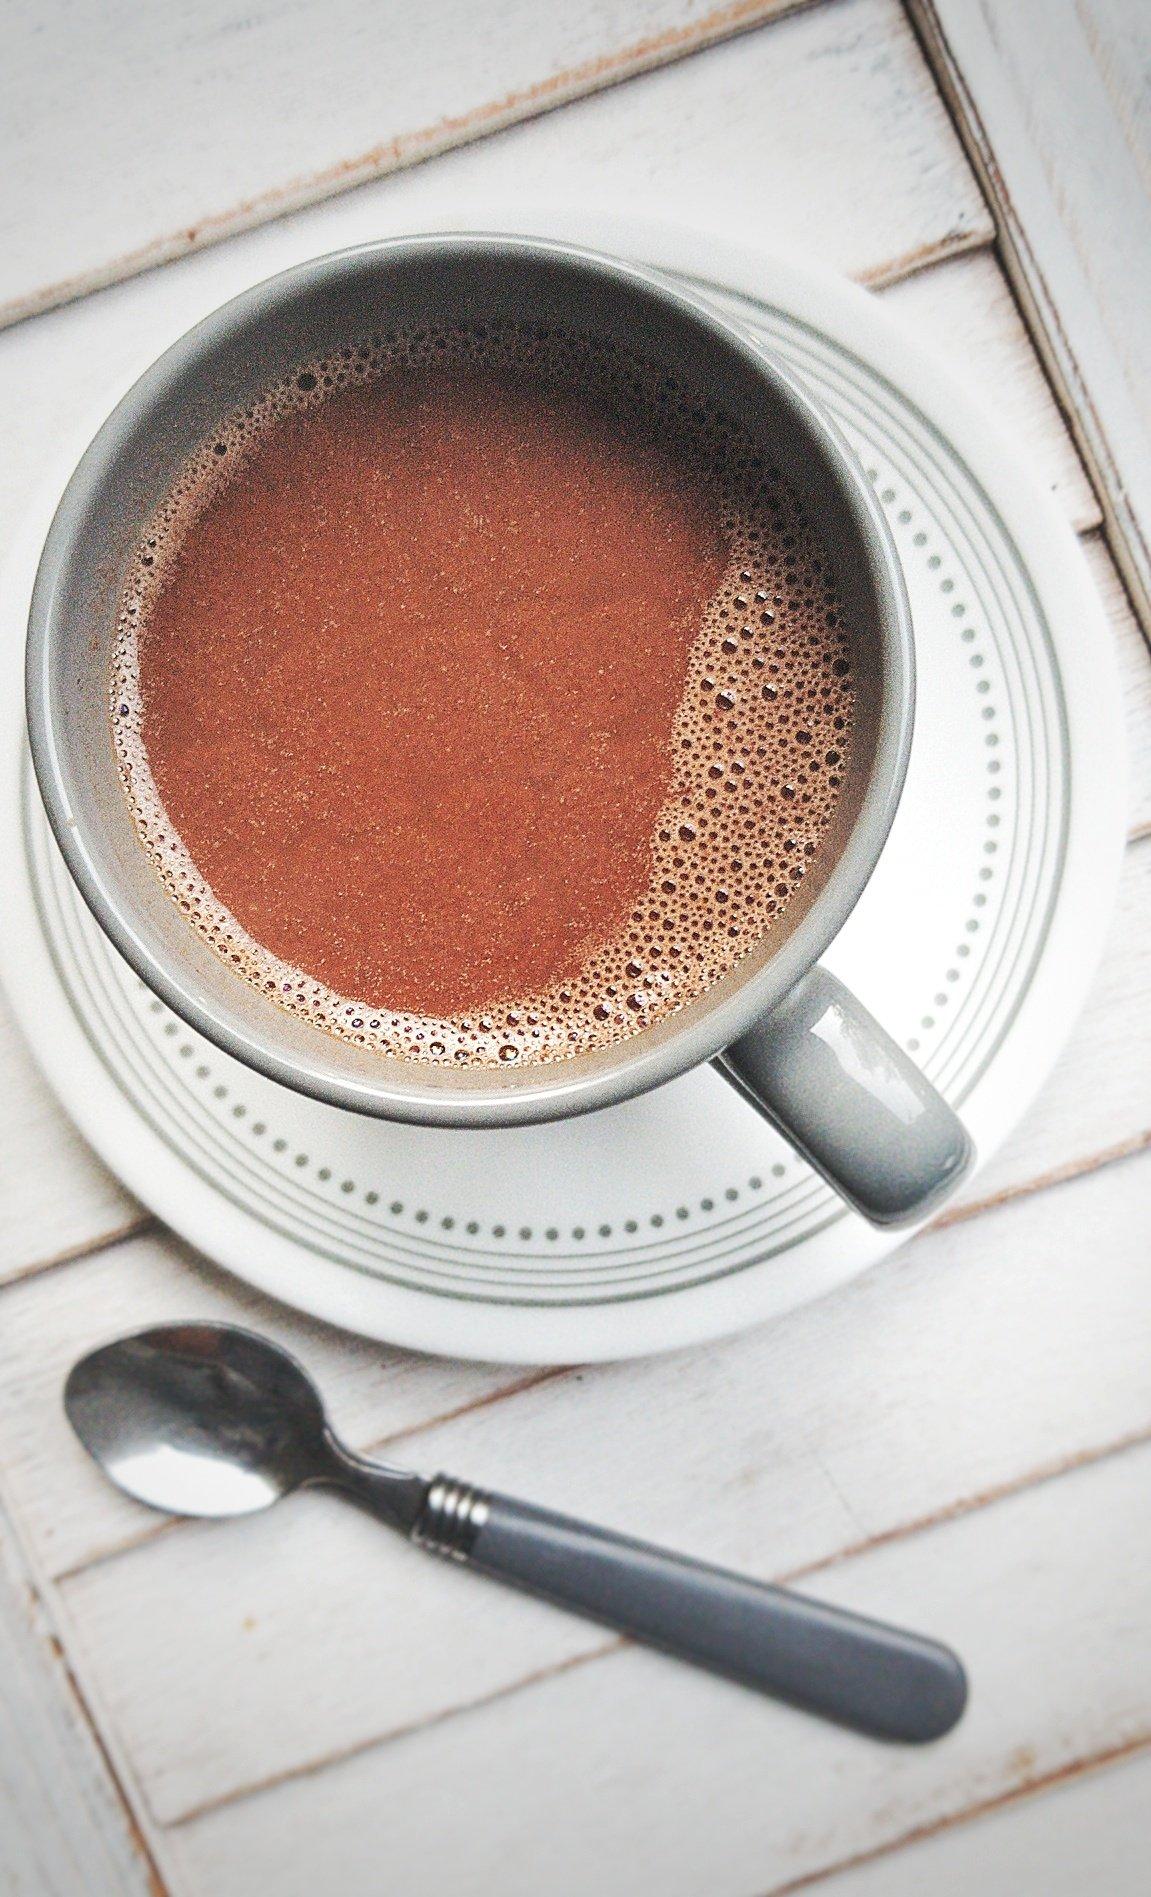 Mug filled with homemade, vegan chocolate milk or hot cocoa